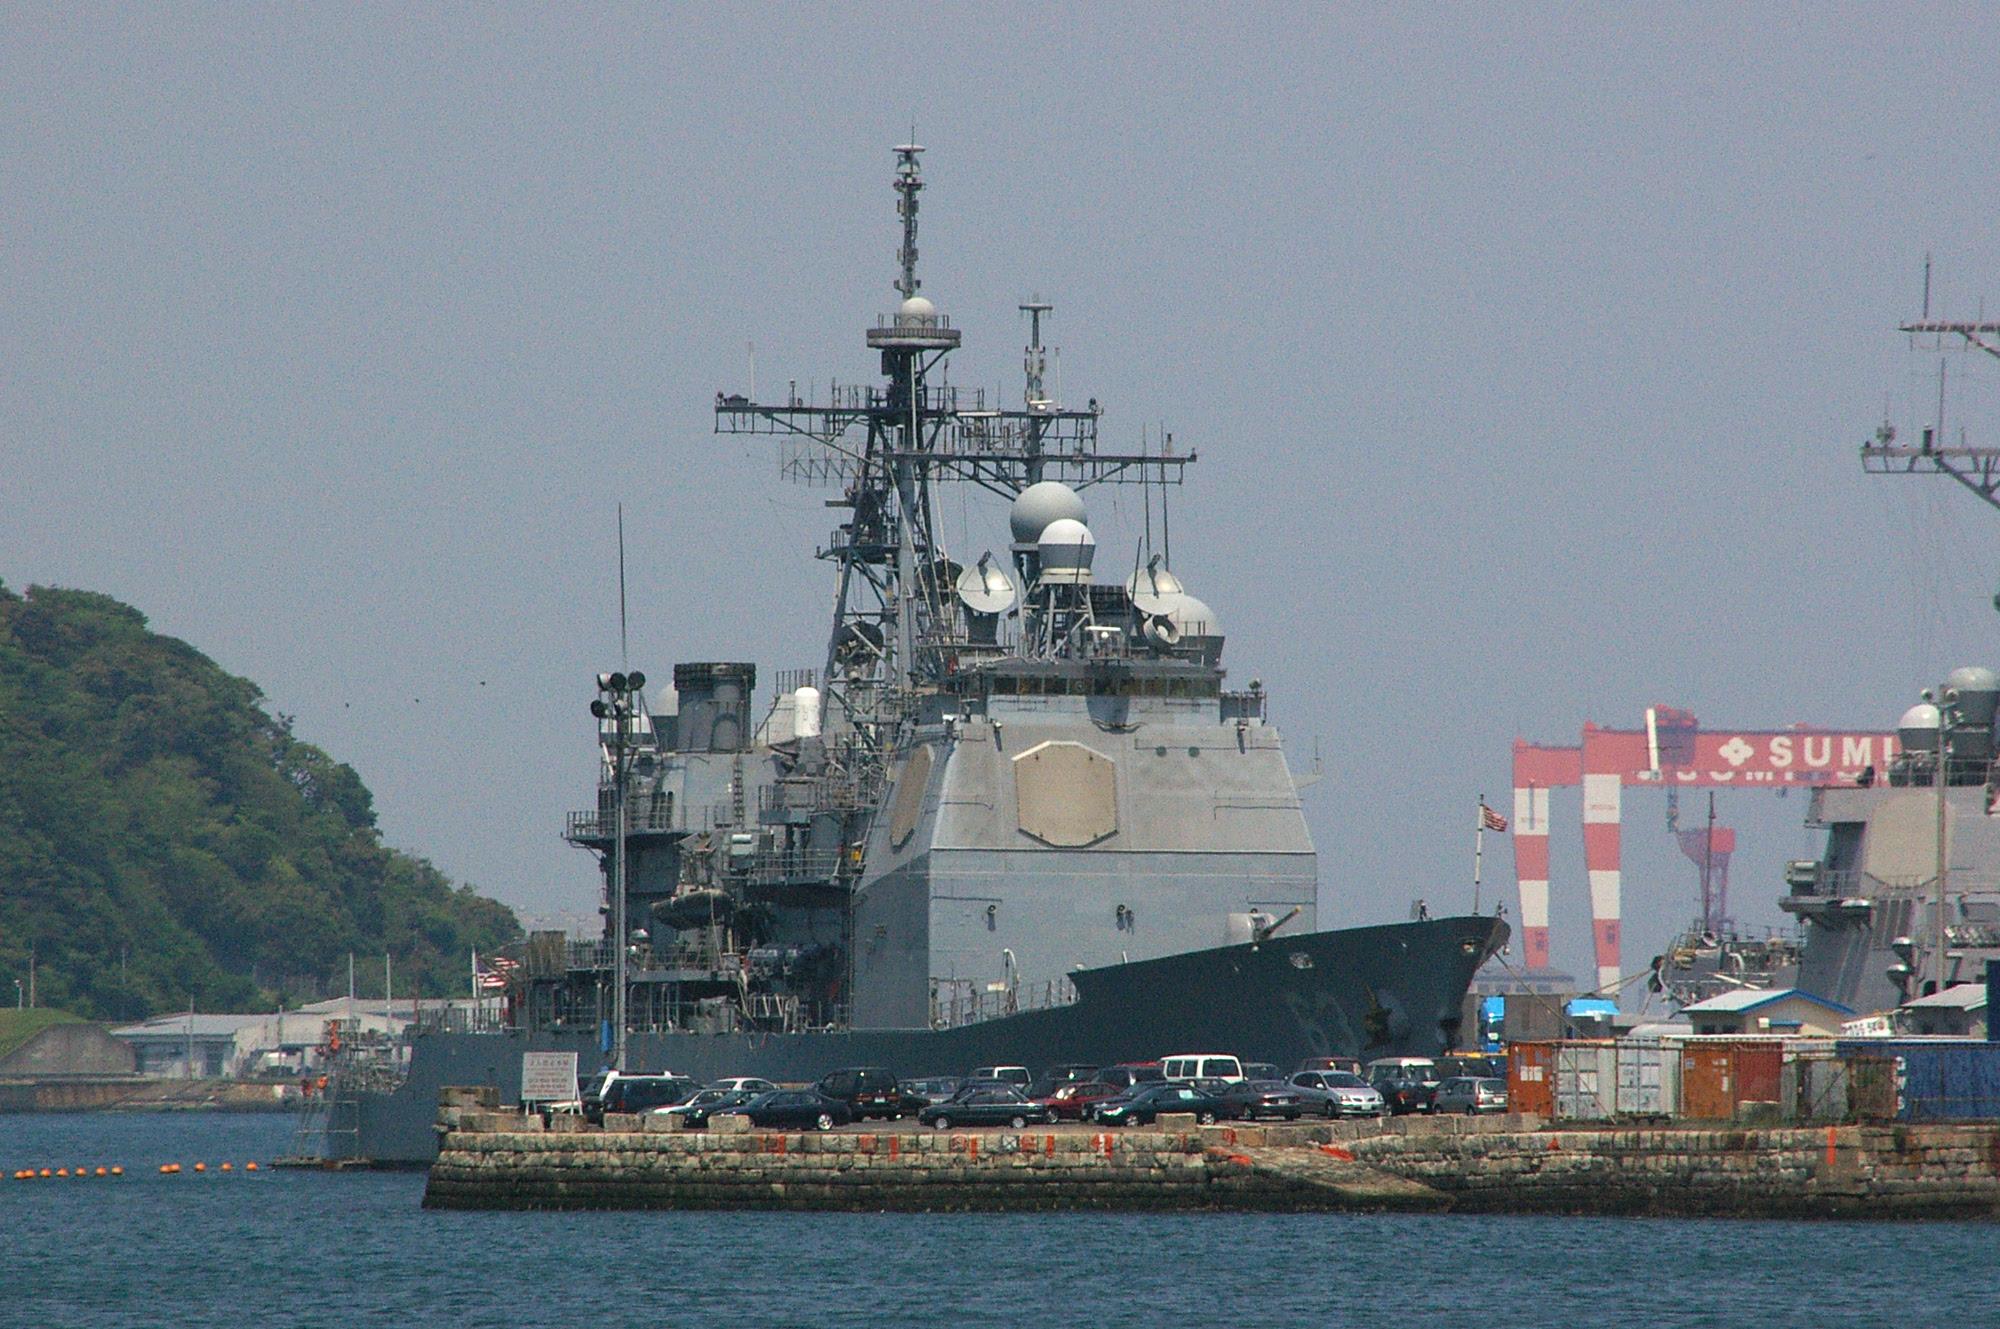 http://upload.wikimedia.org/wikipedia/commons/4/4f/USS_Cowpens_(CG-63).jpg